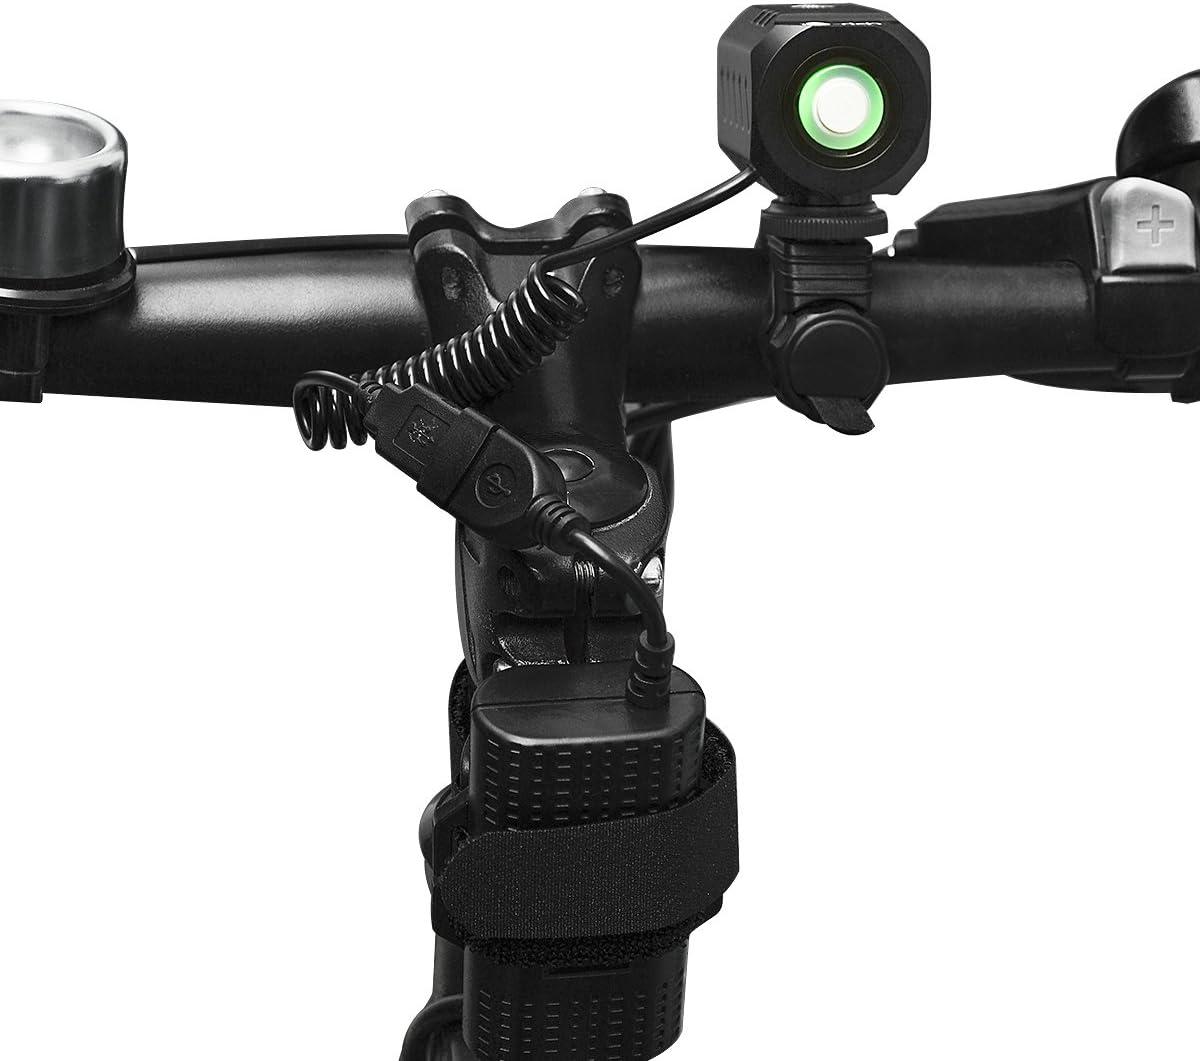 Super Bright Bike Light USB Rechargeable Te-Rich 1200 Lumens Waterproof Road...